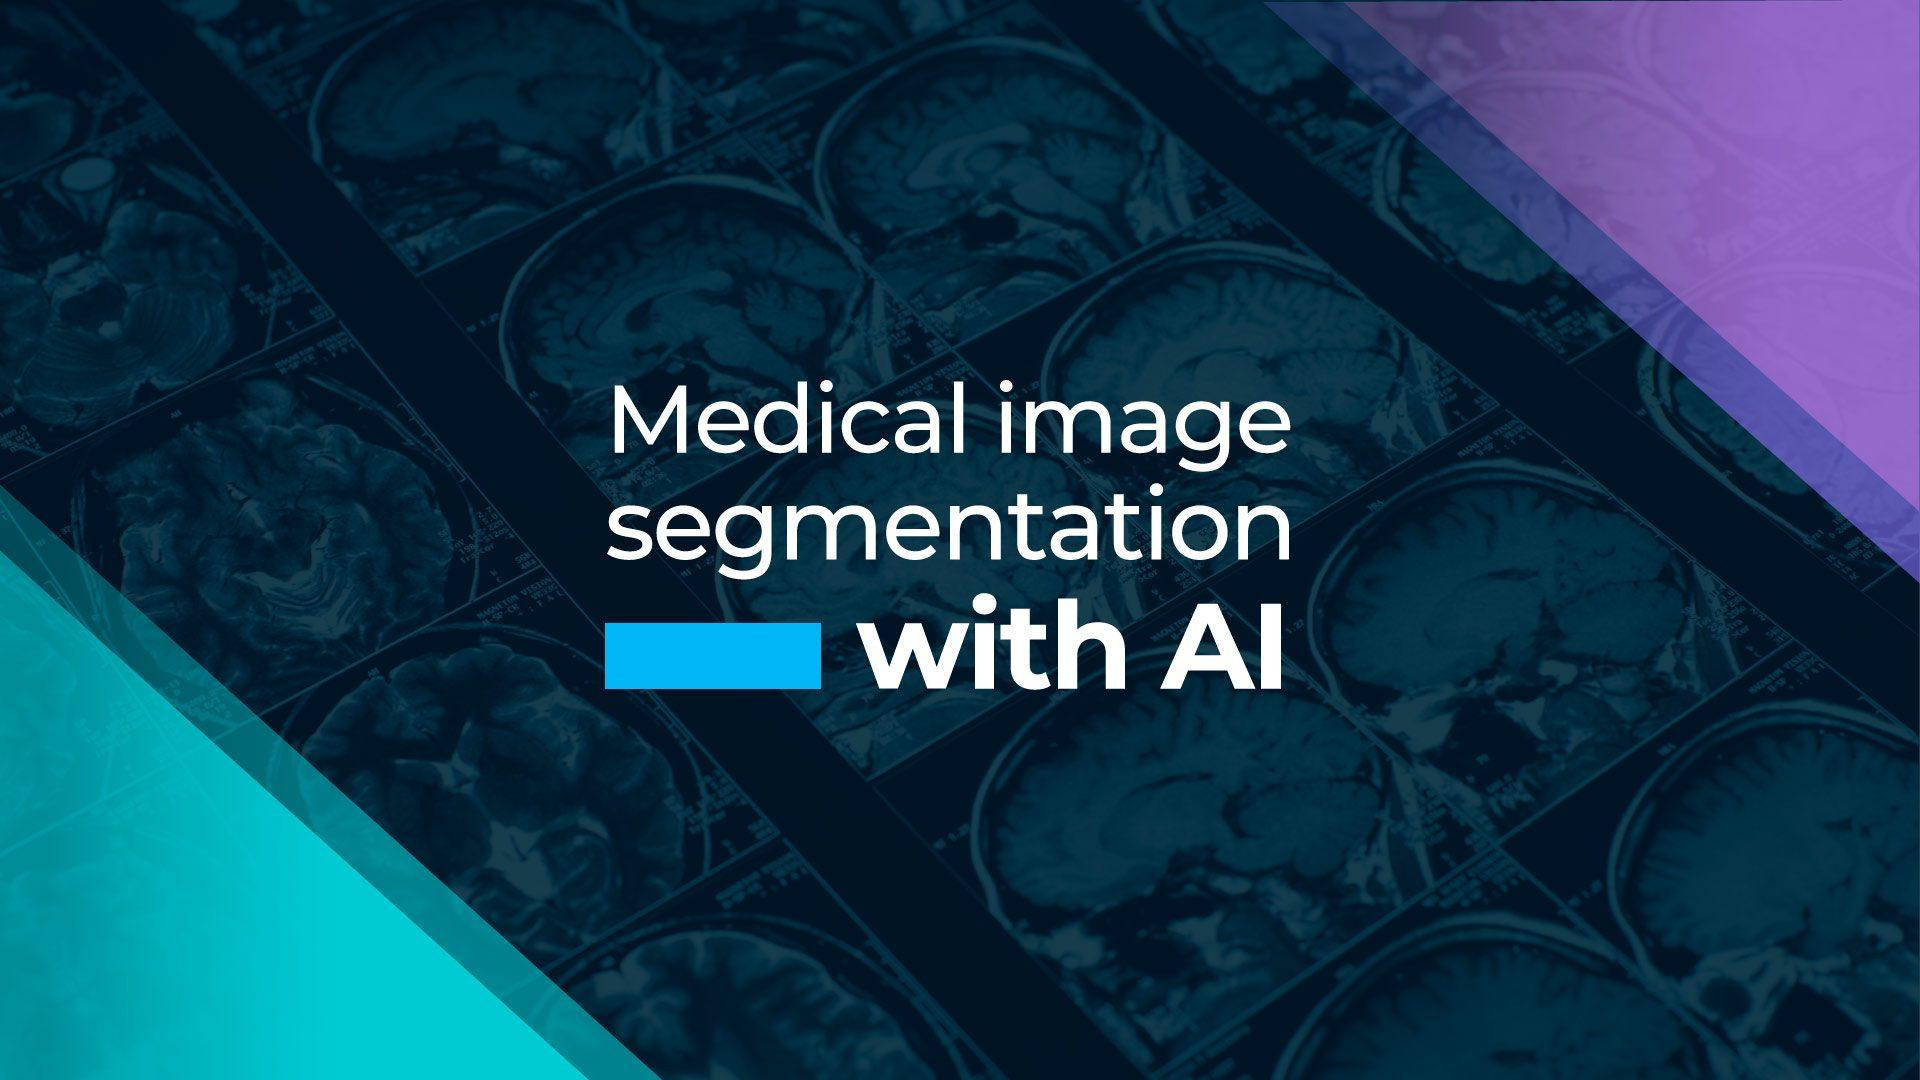 Medical image segmentation with AI